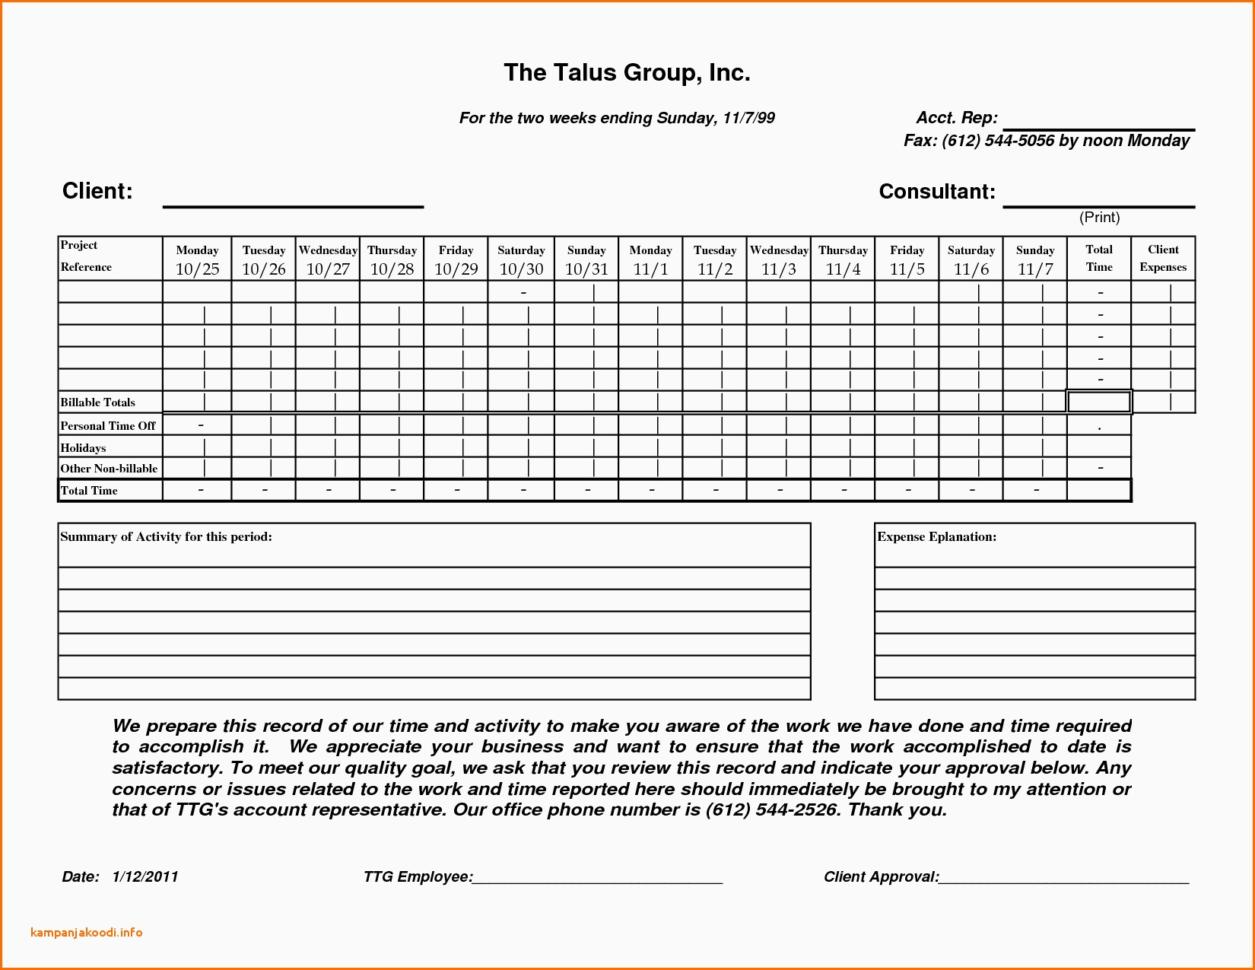 time clock spreadsheet template time clock sheets template  46 Time Clock Spreadsheet   Resume Template   Resume Template Throughout Time Clock Sheet Template Time Clock Sheet Template Timeline Spreadshee